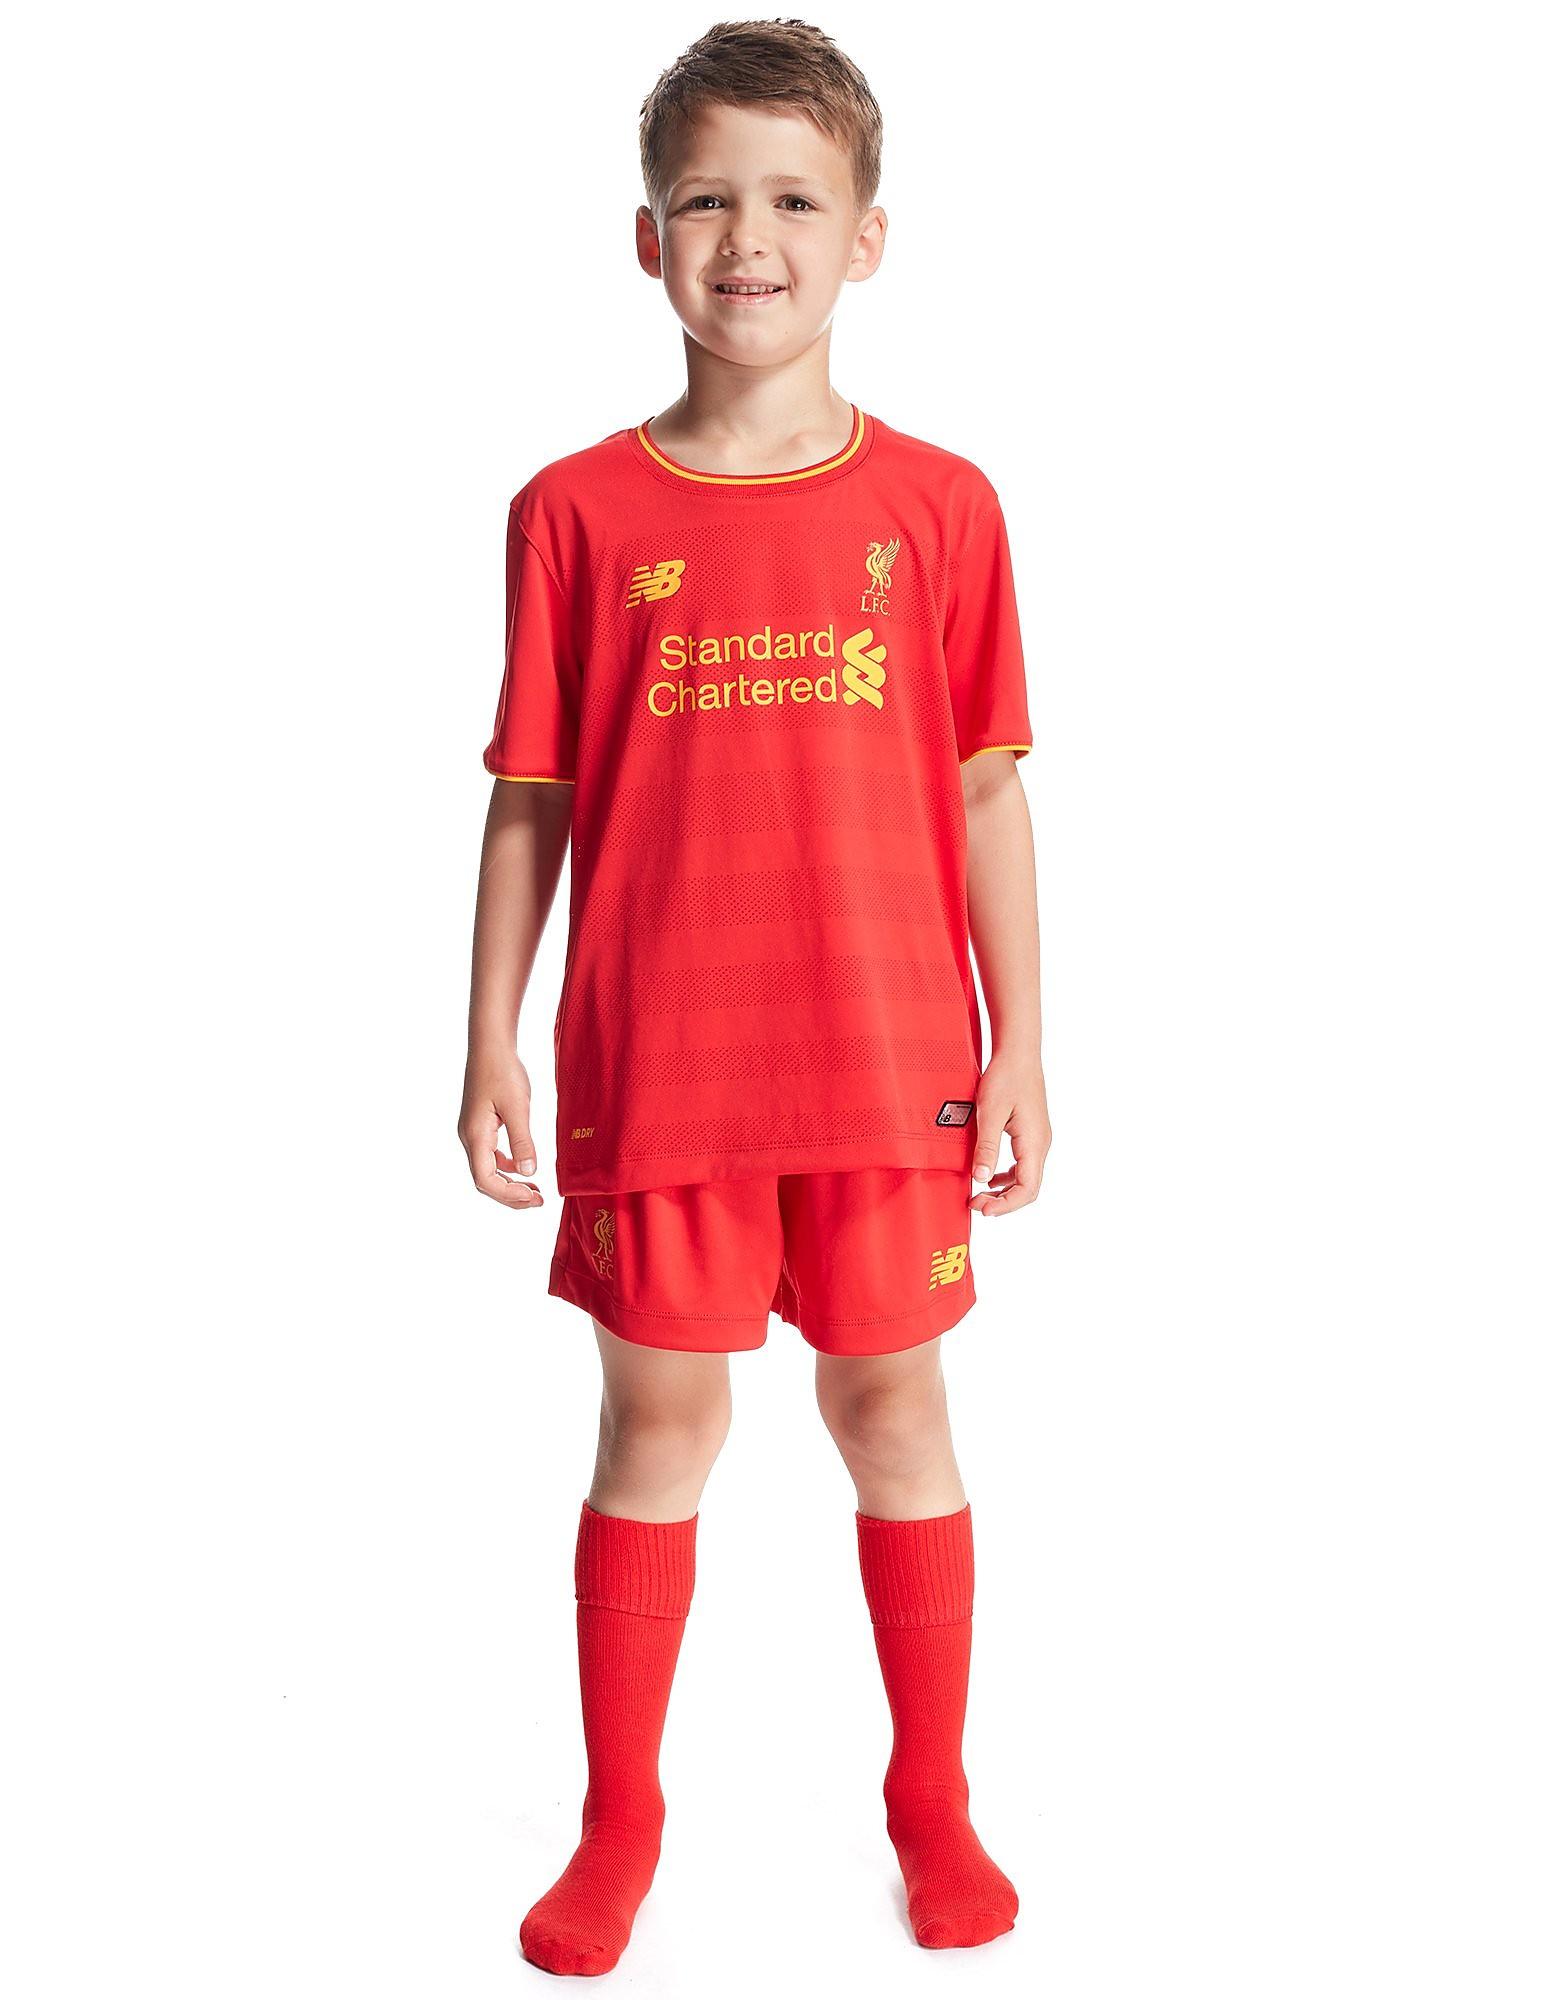 New Balance Liverpool FC 2016/17 Home Kit Children